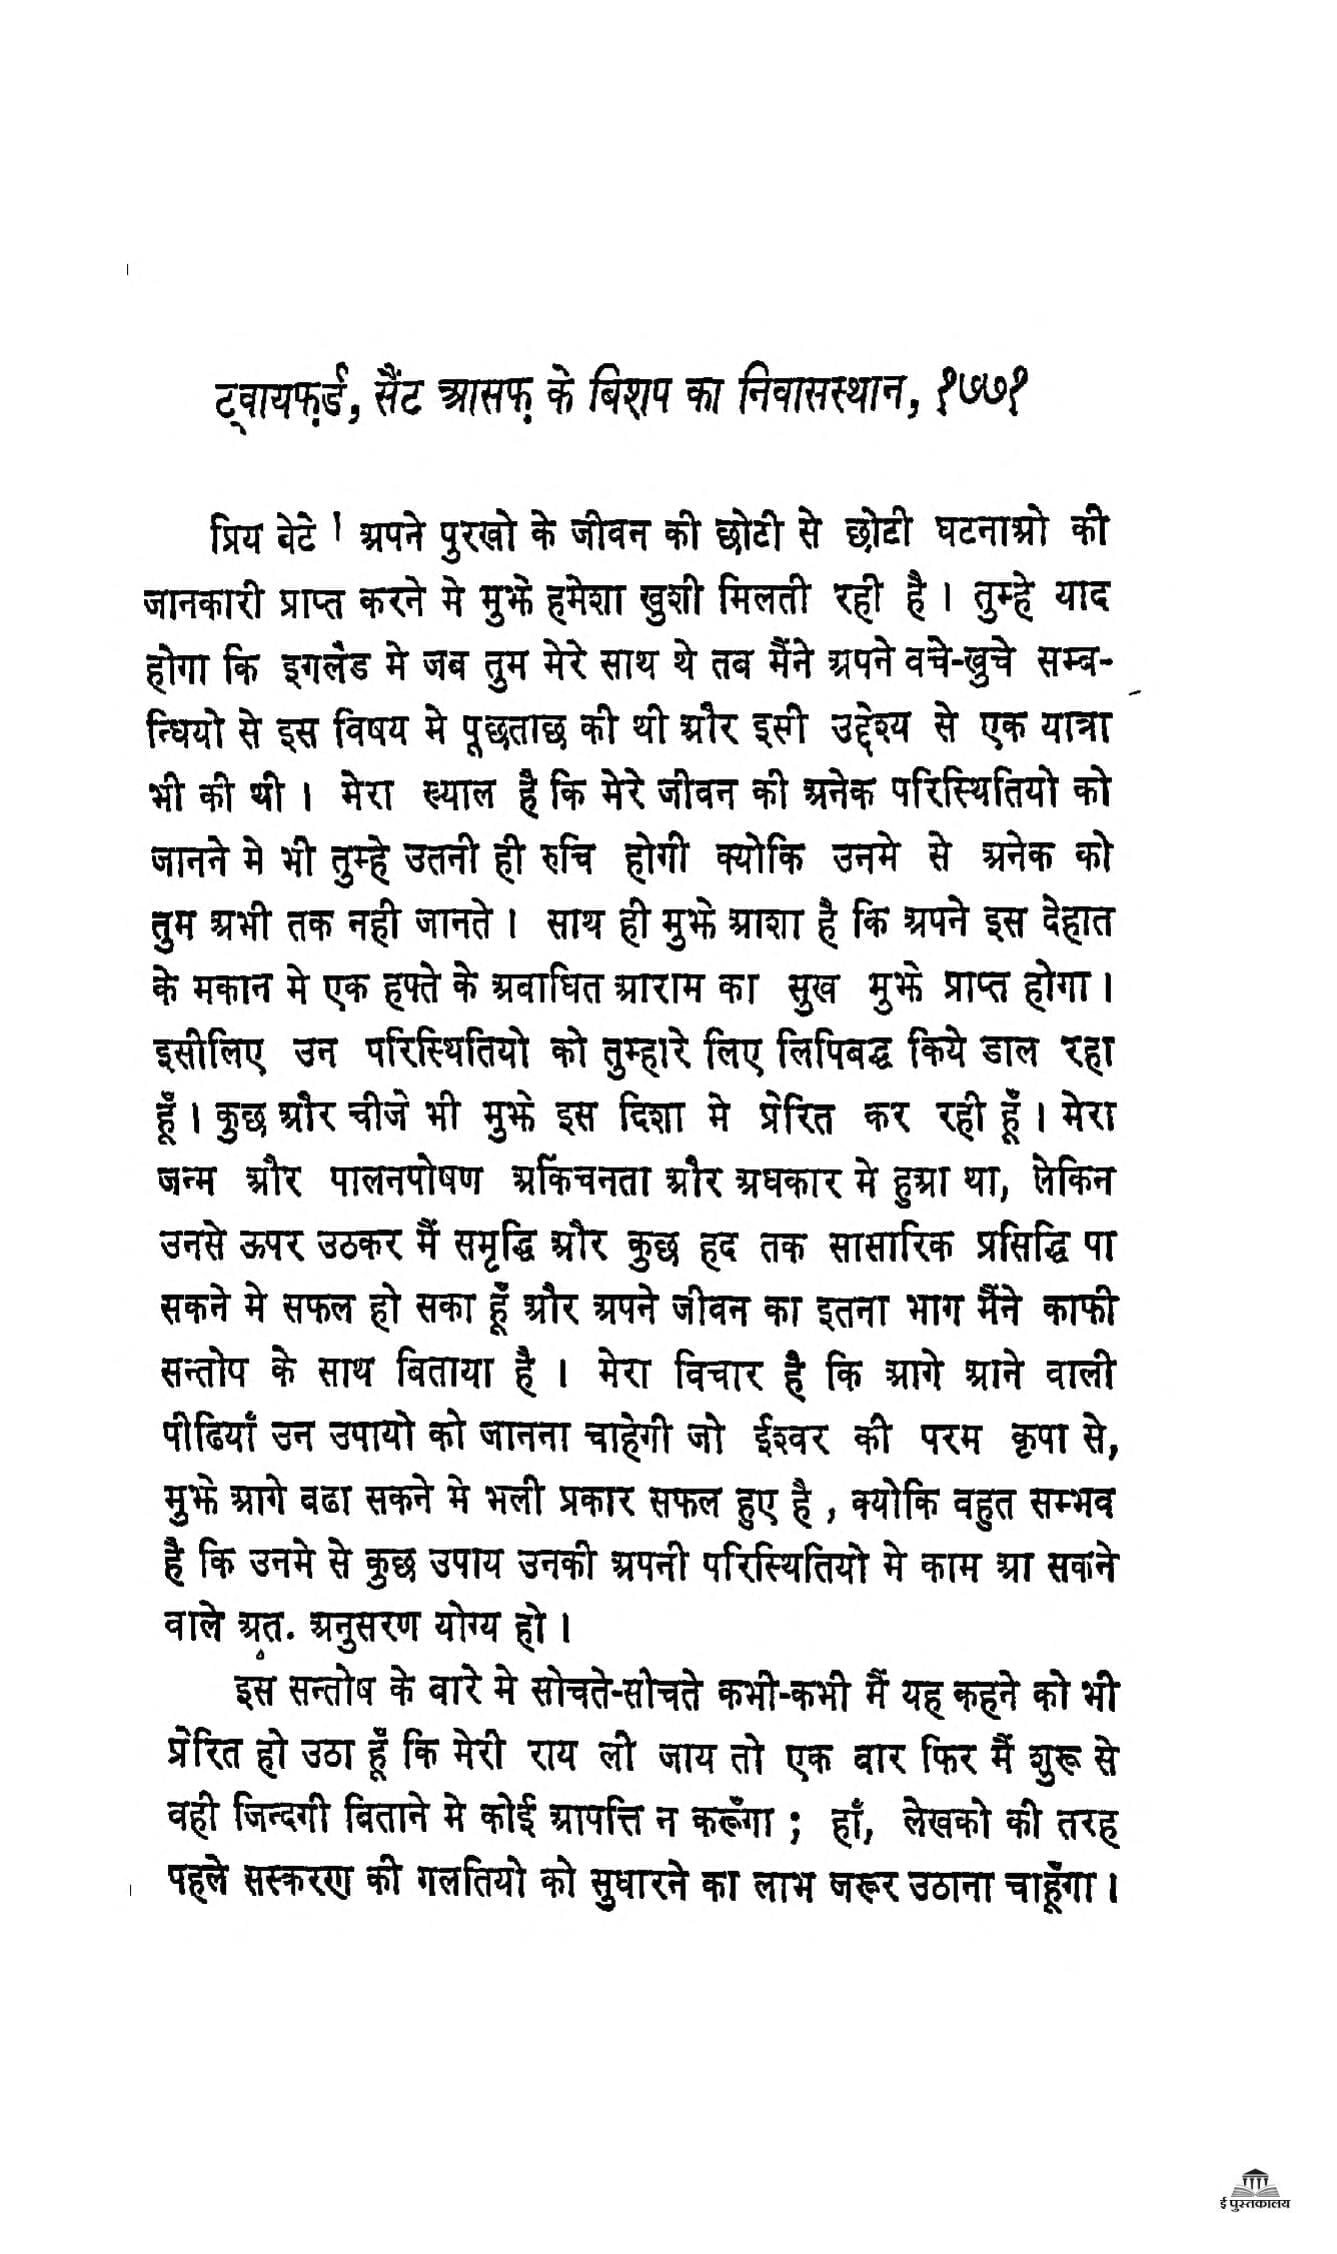 Benjamin Franklin Autobiography Pdf In Hindi